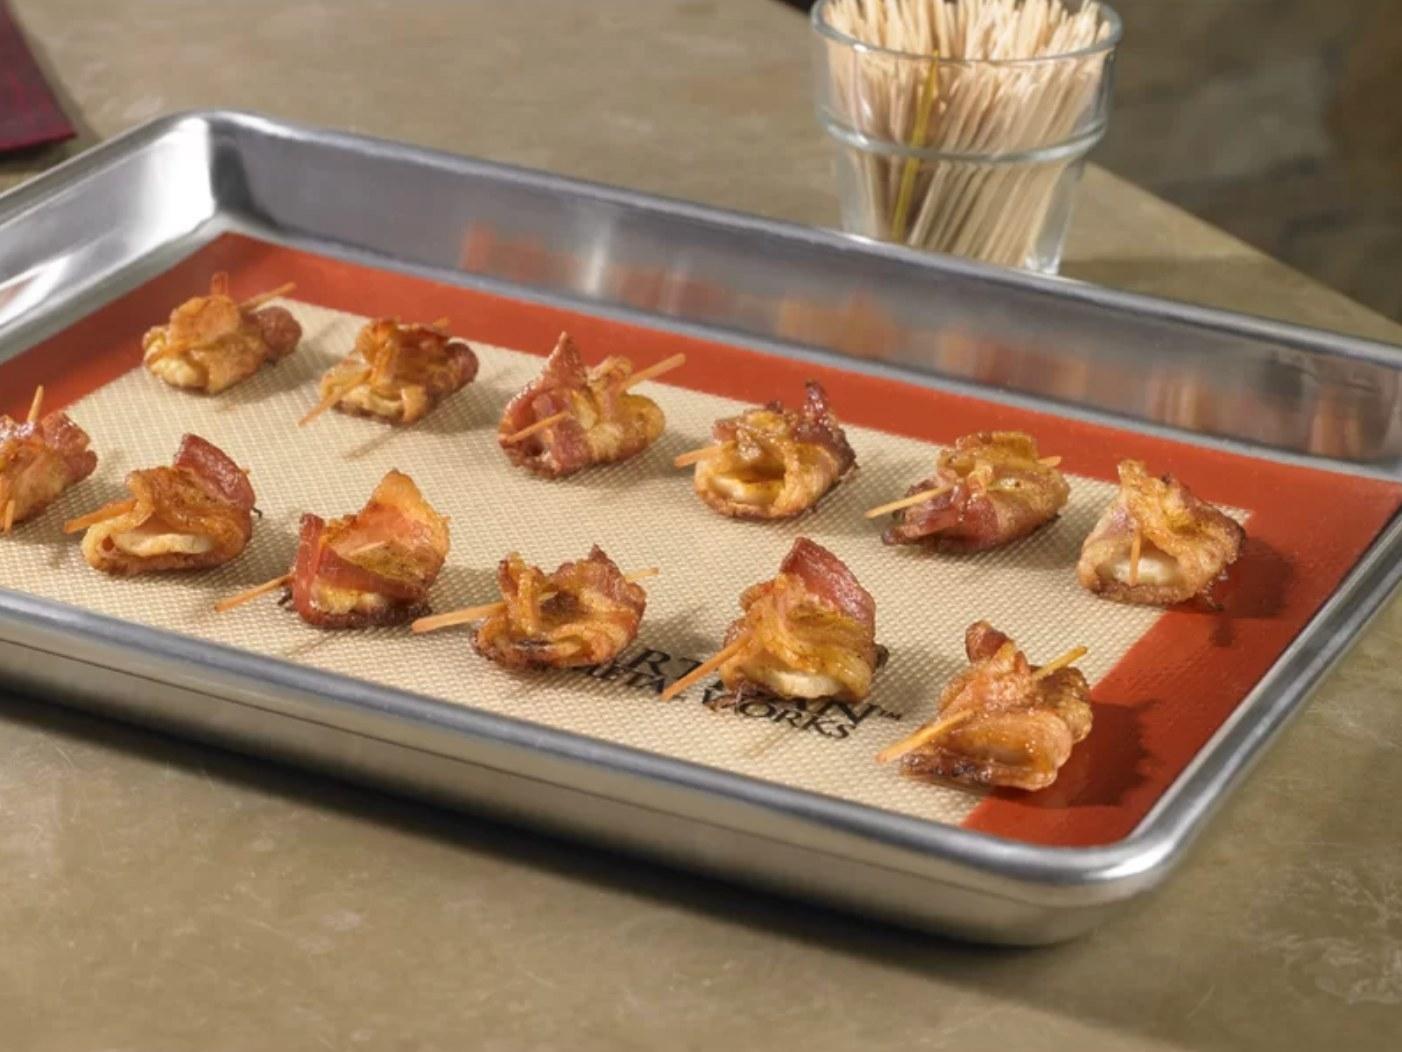 The professional baking sheet and baking mat